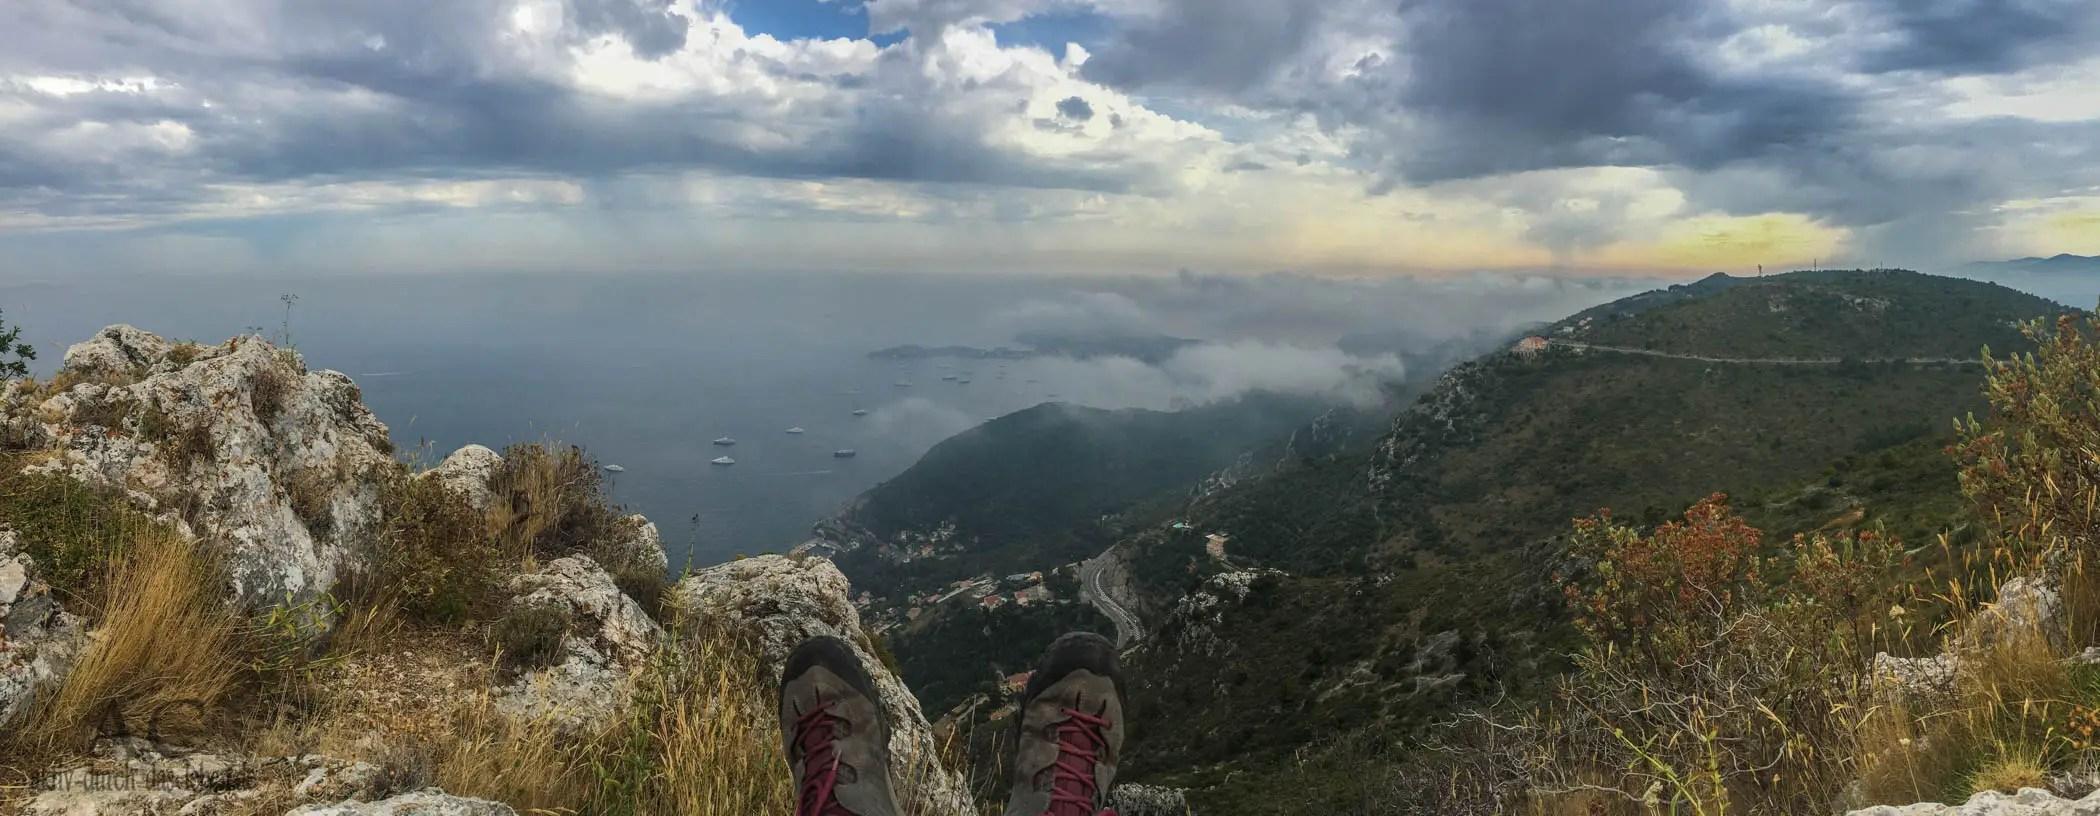 Wandern an der Côte d'Azur – Éze und Mont Bastide